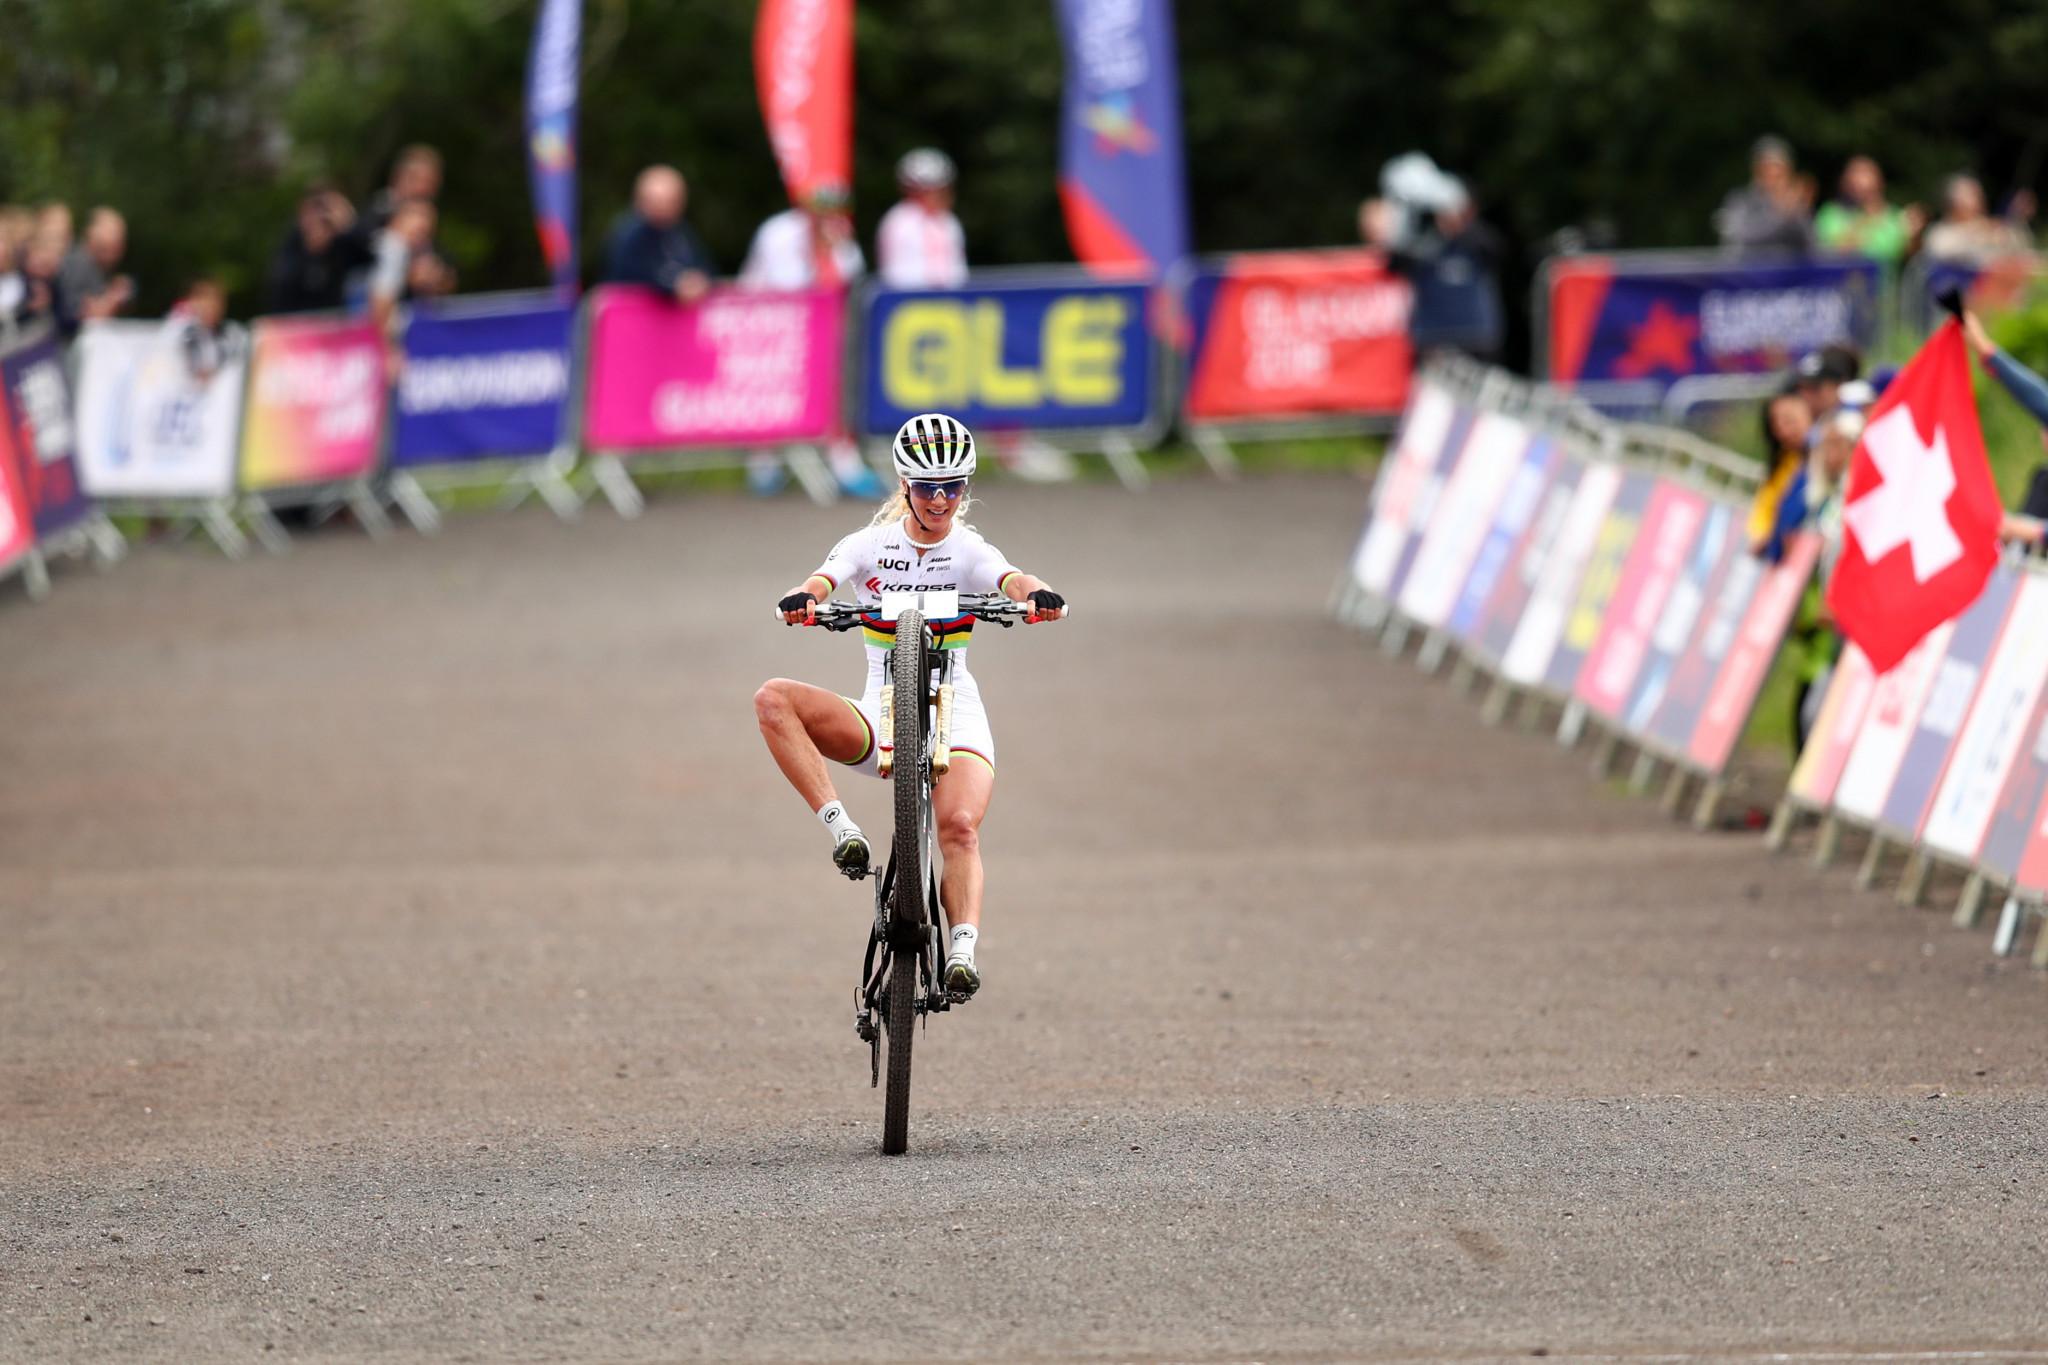 World champion Neff clinches third European Championships mountain bike crown